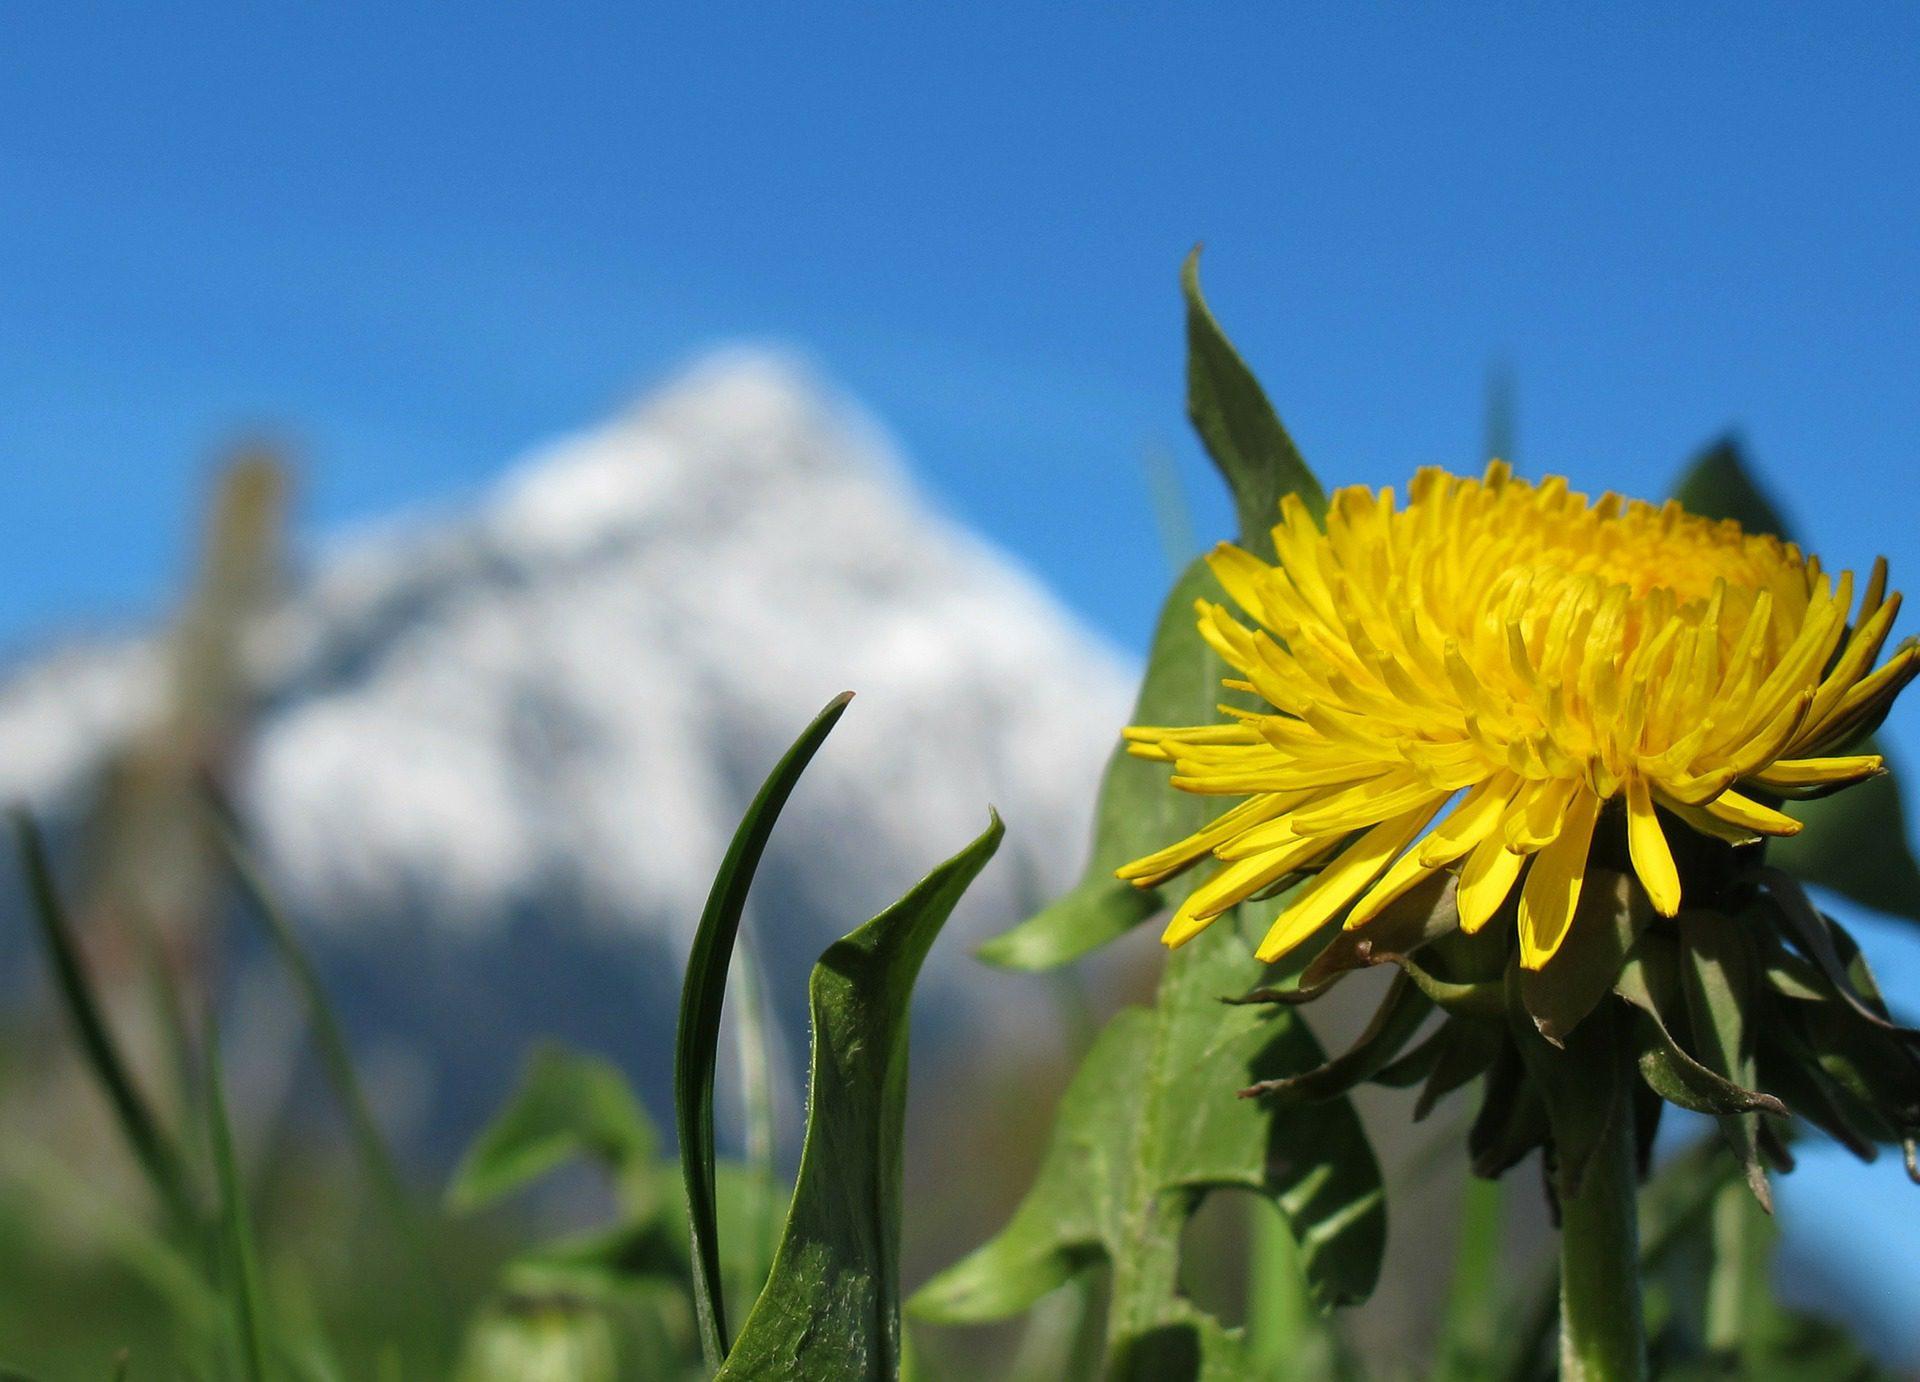 Dandelion-the secret weed you should be eating